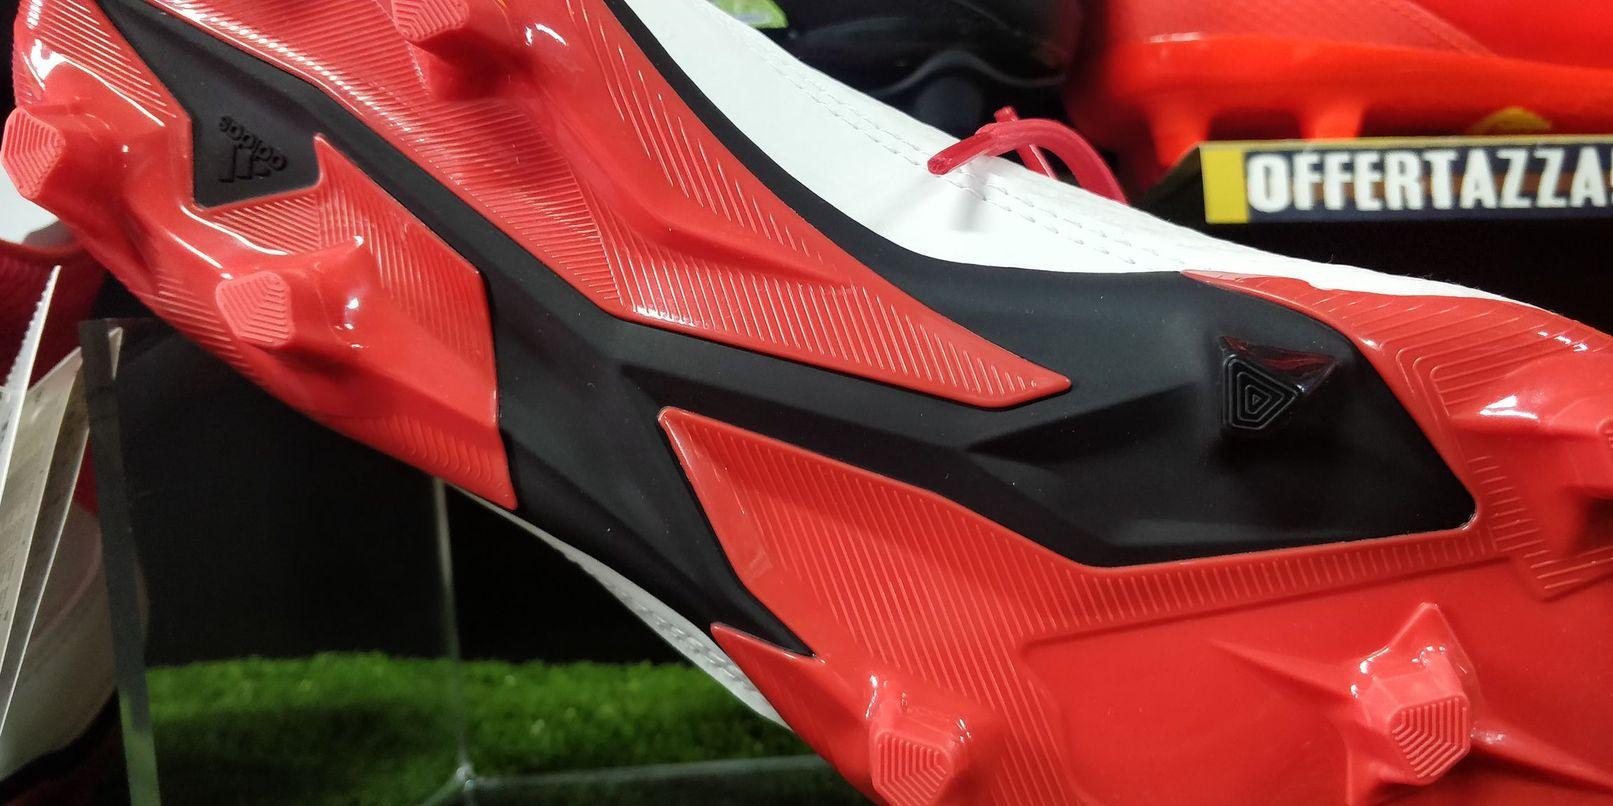 buy online 8b064 0d699 Adidas Scarpe da Calcio Predator 18.3 FG Bianco con calzino